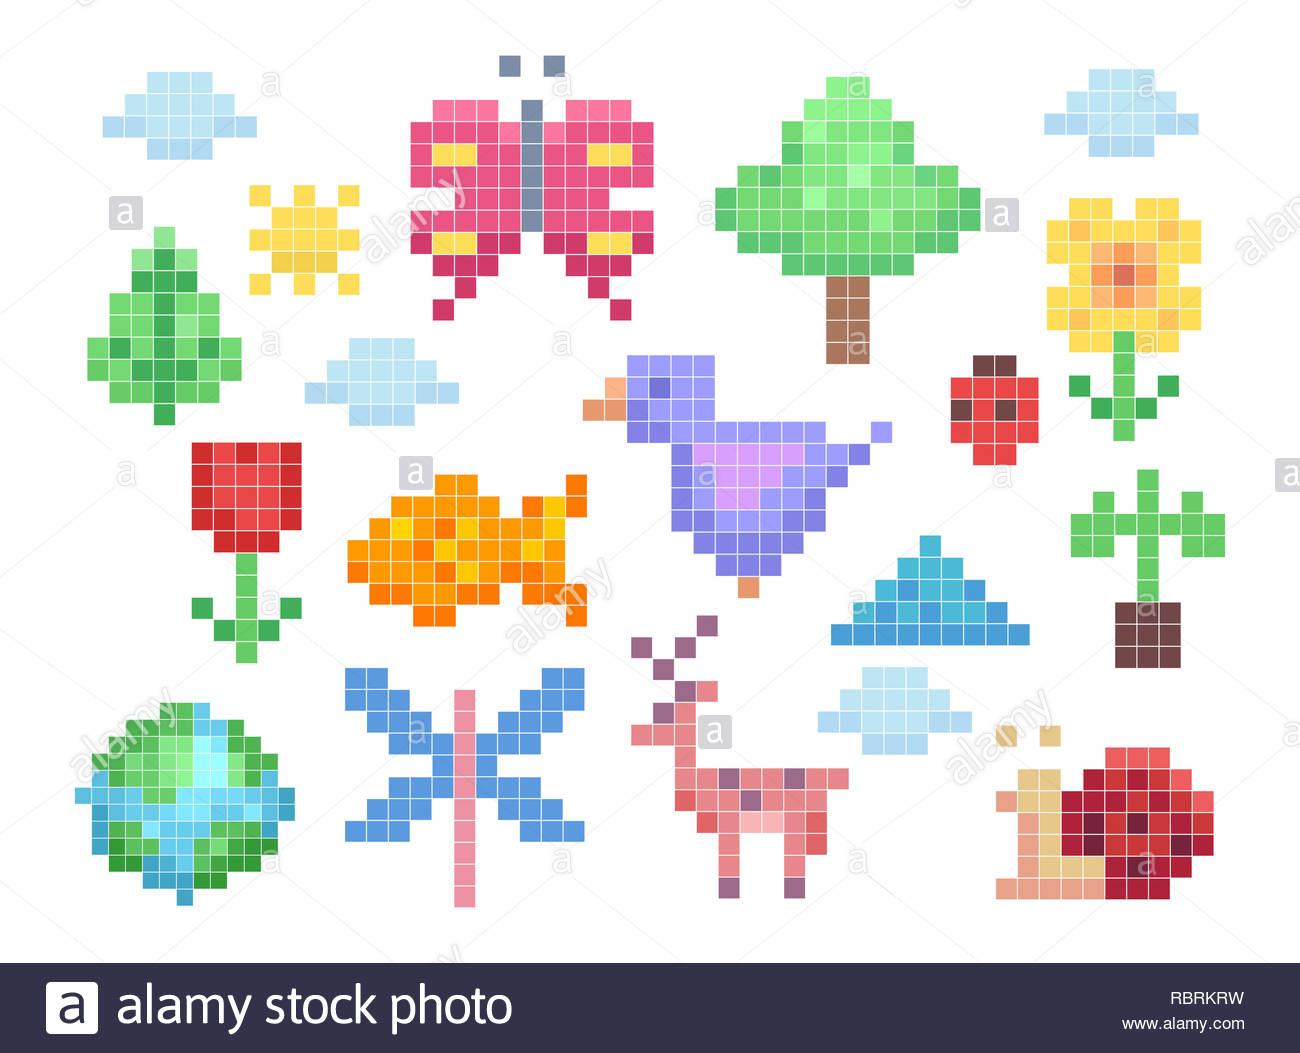 Pixel Art Animals Photos & Pixel Art Animals Images - Alamy pour Pixel Art Flamant Rose